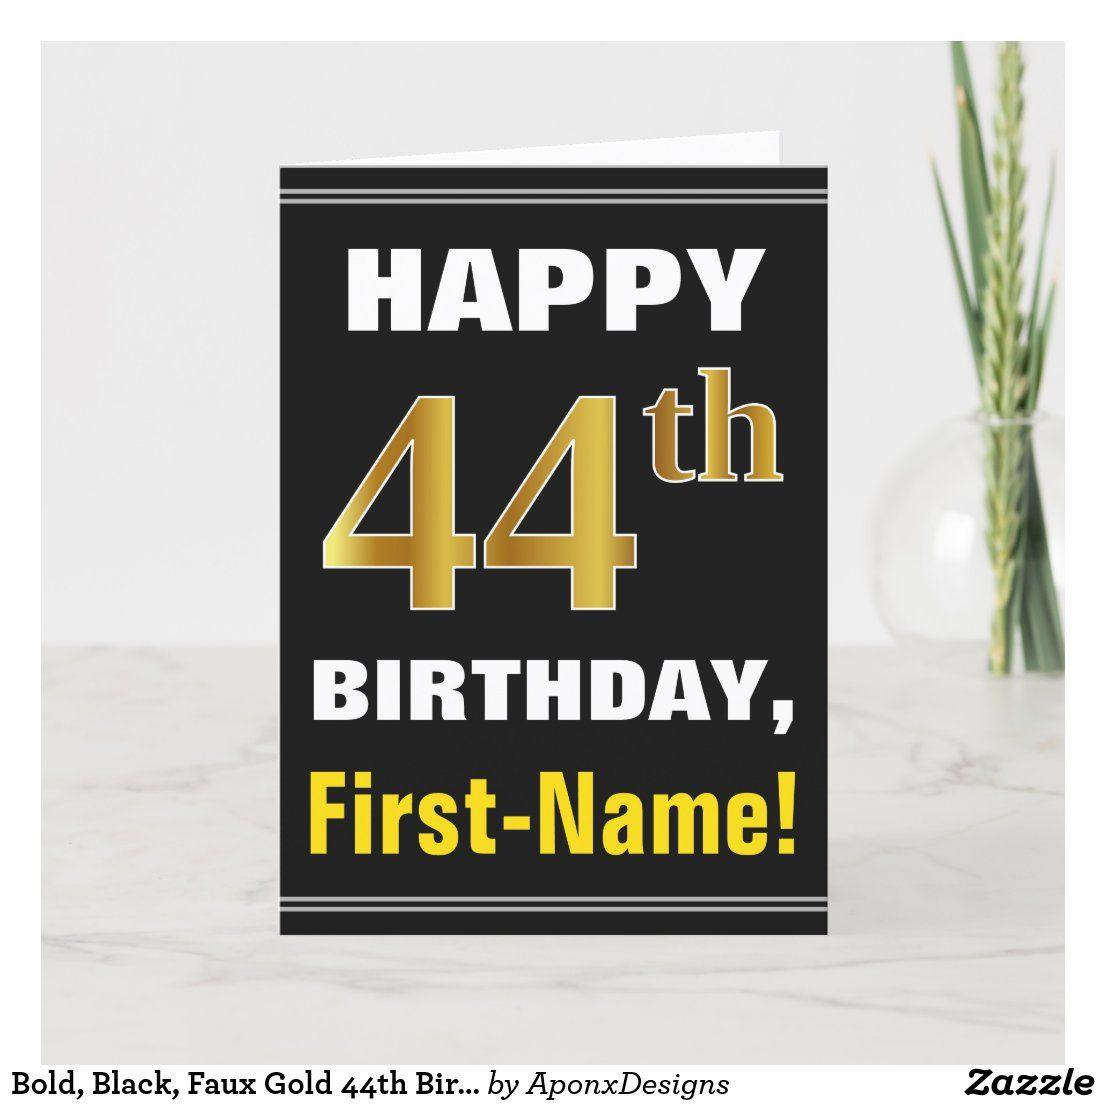 Bold, Black, Faux Gold 44th Birthday w/ Name Card